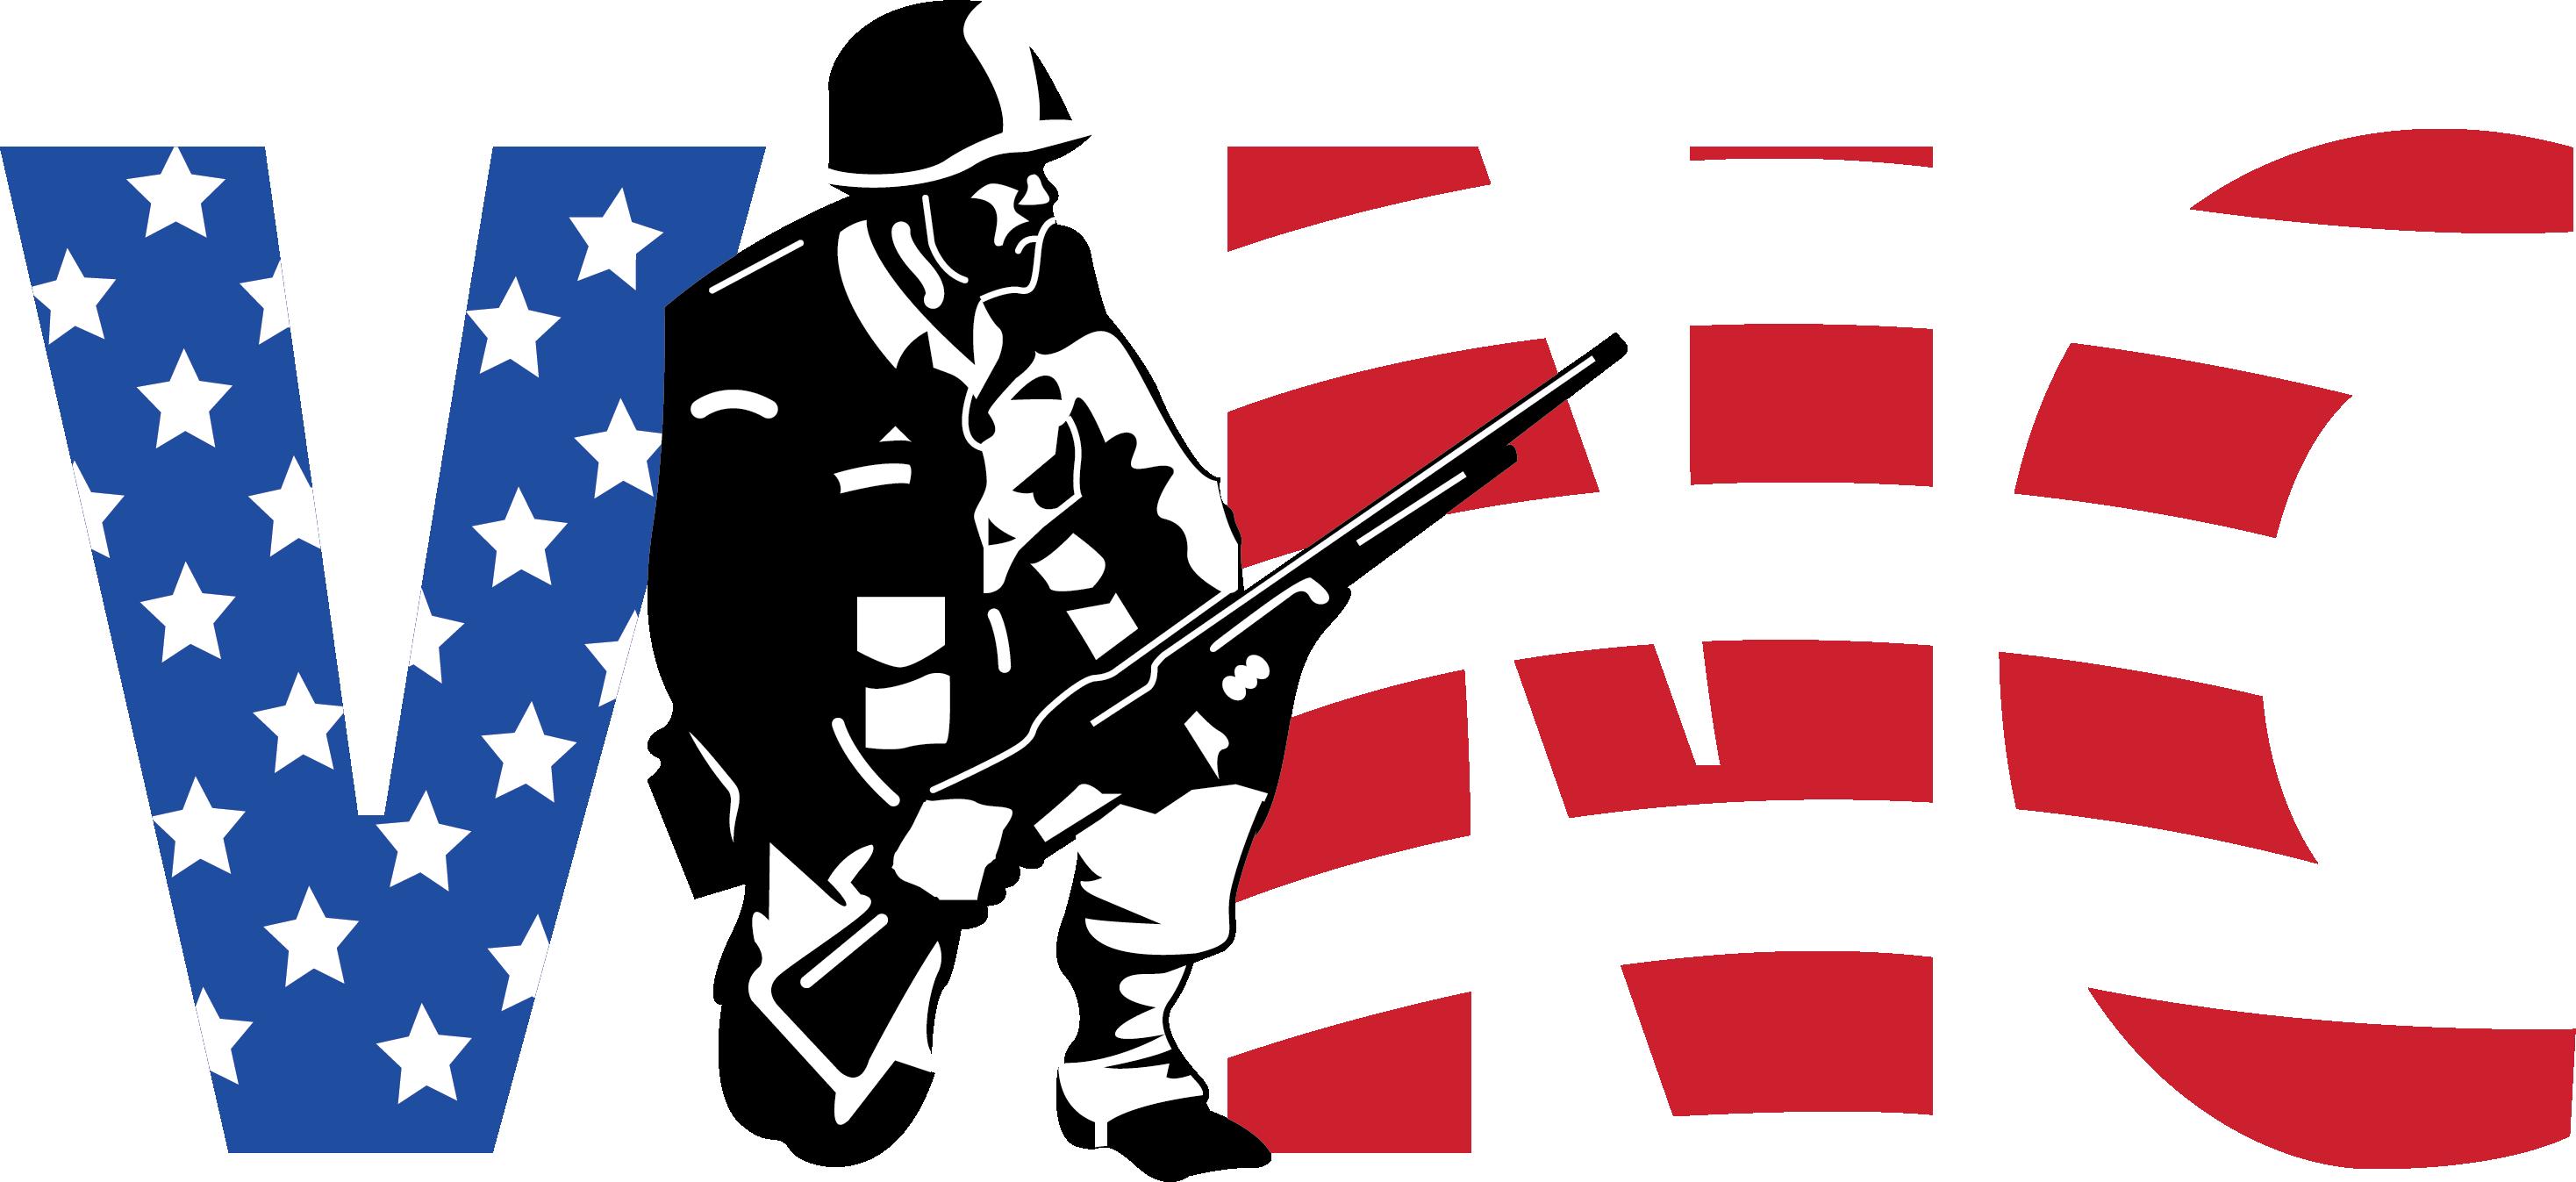 VANC Logo - Veterans Association of North County